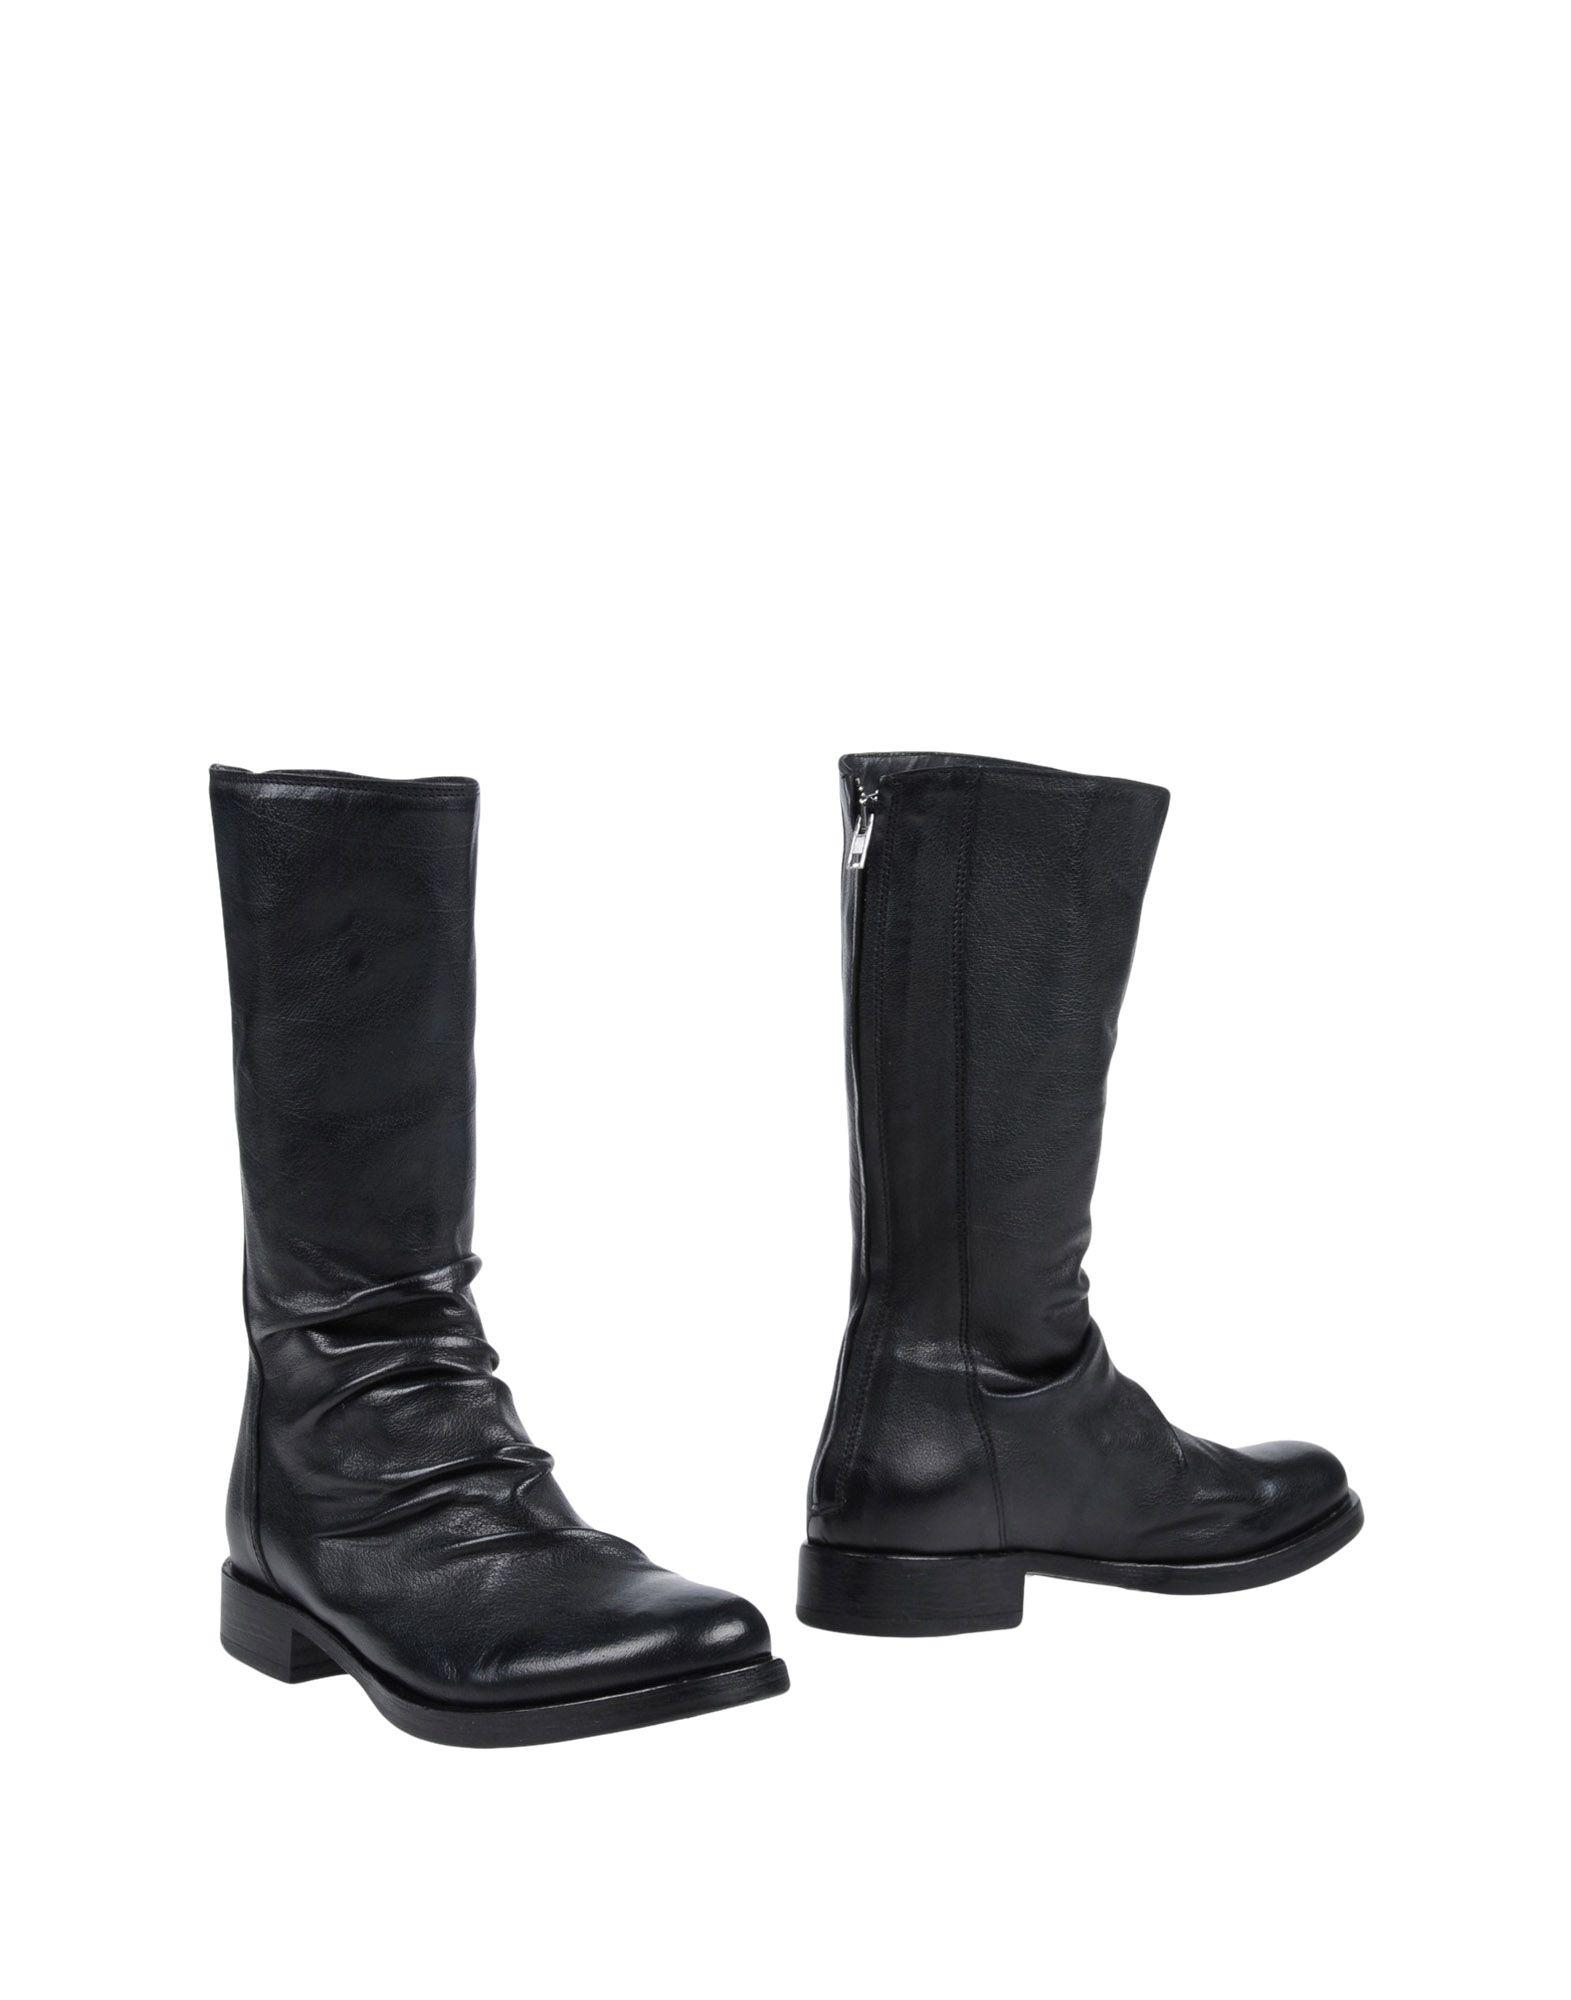 OPEN CLOSED SHOES Сапоги kemekiss women peep open toe high heel sandals thin heels wedding shoes woman back strap heeled footwear size30 46 pa00328